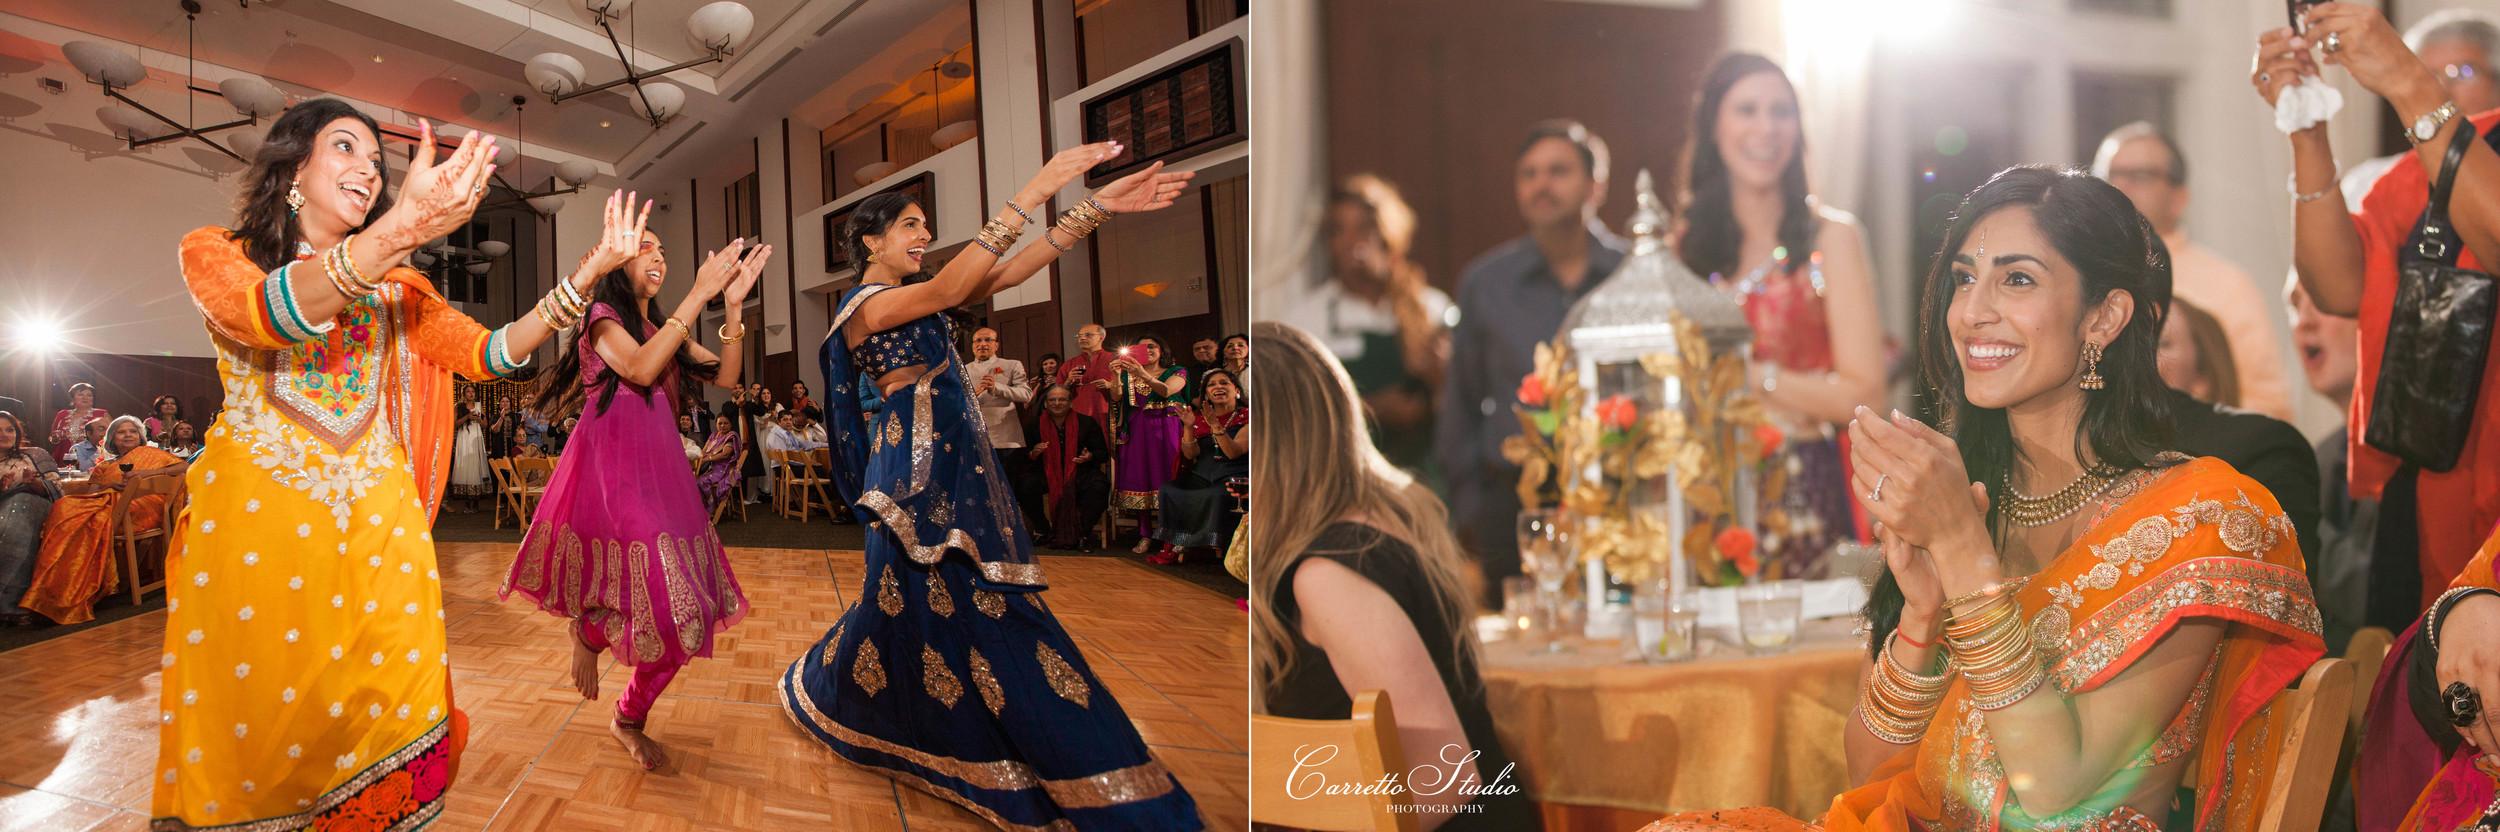 St Louis Wedding Photography-1045 copy.jpg